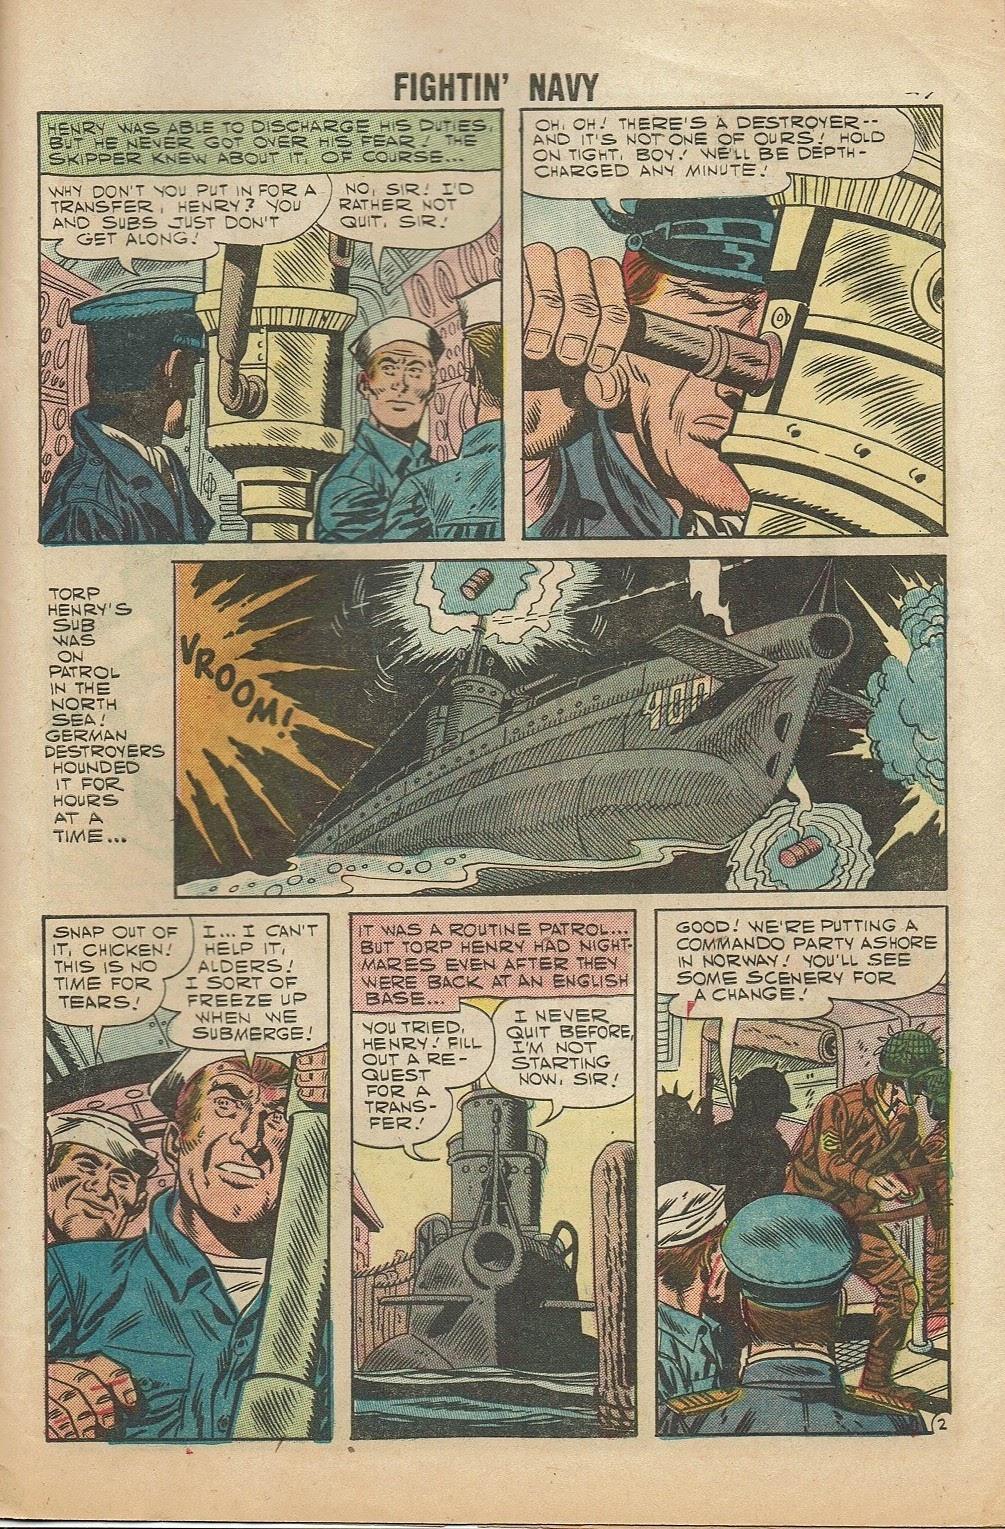 Read online Fightin' Navy comic -  Issue #81 - 29